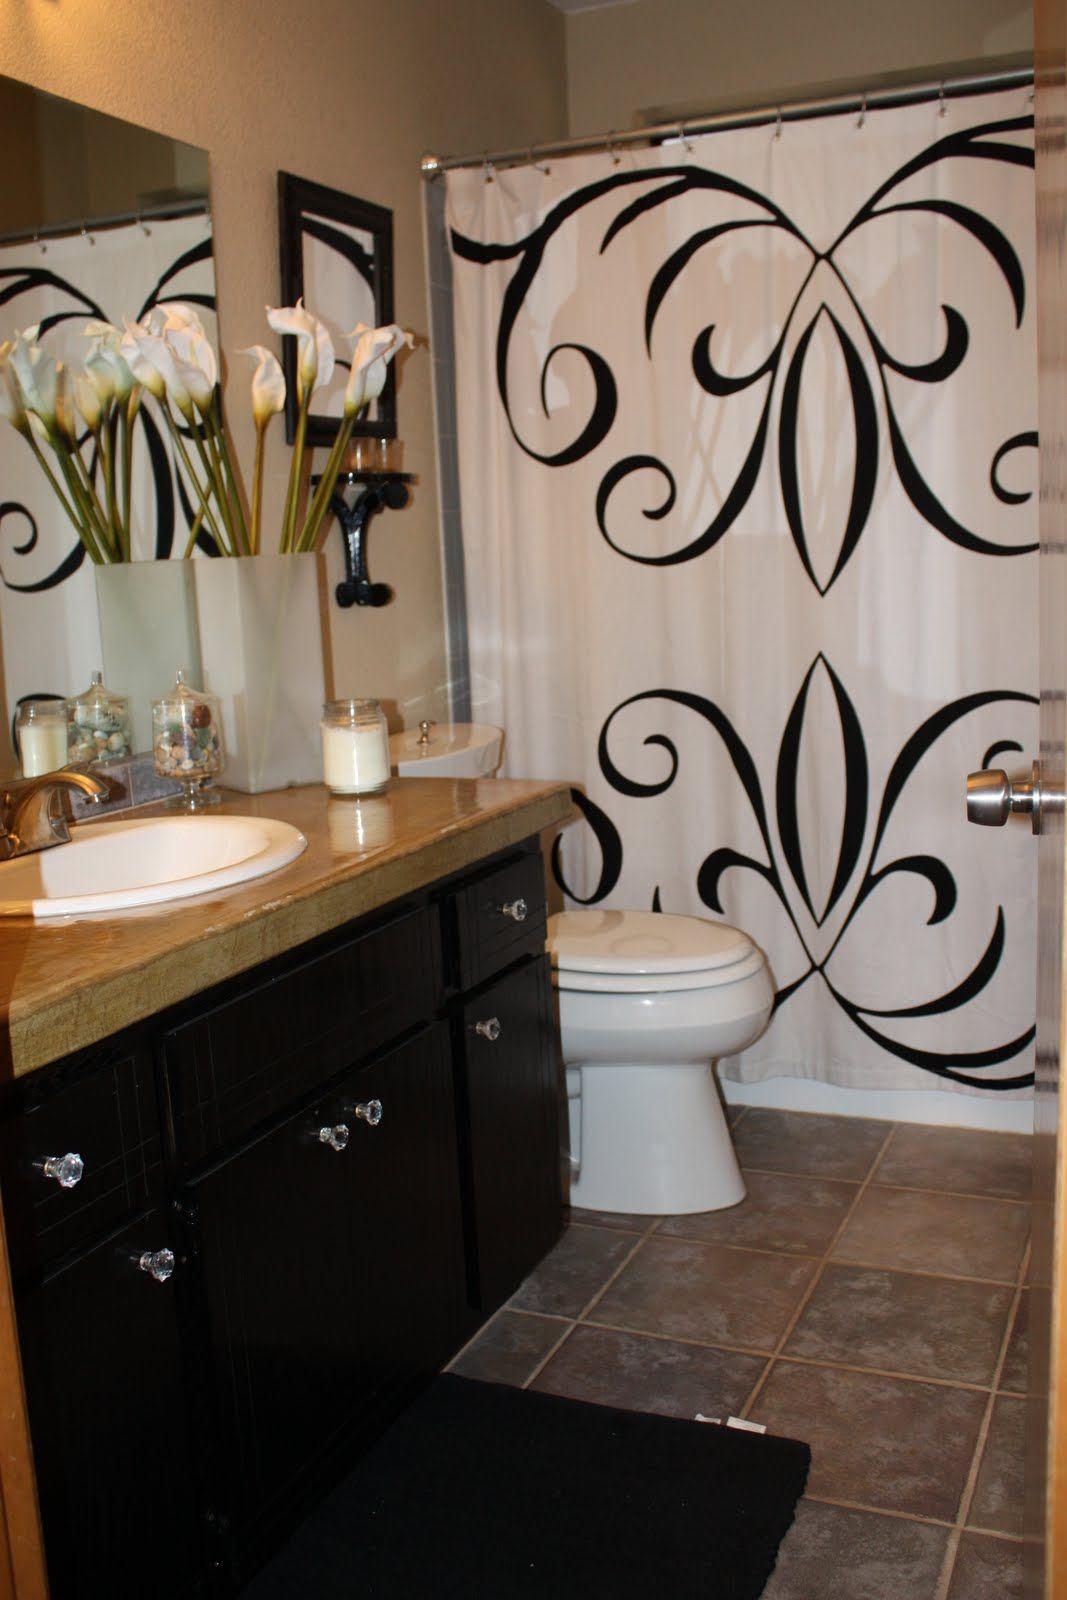 Oak cabinets painted black house ideas pinterest - Painting bathroom cabinets black ...